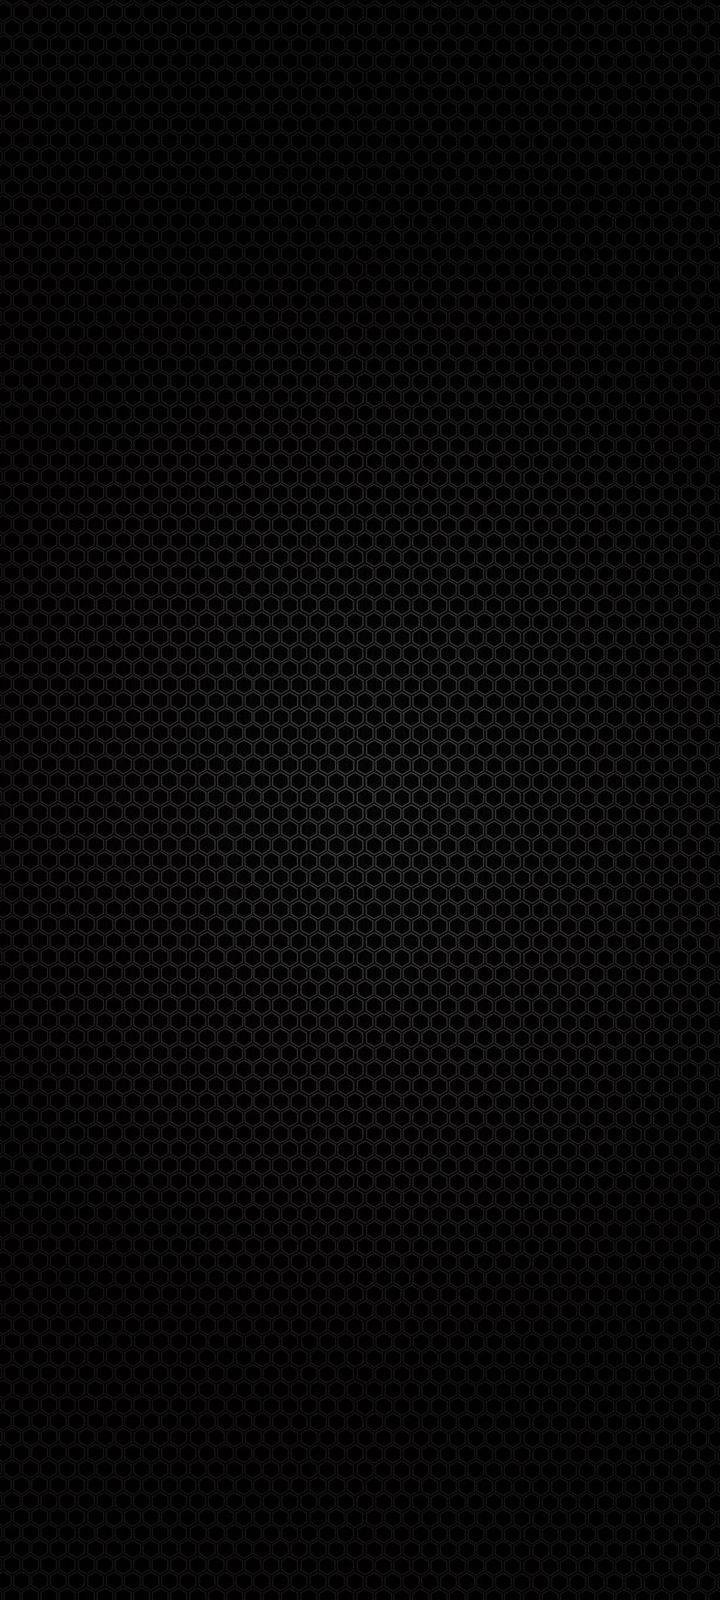 Mesh Texture Dark Wallpaper 720x1600